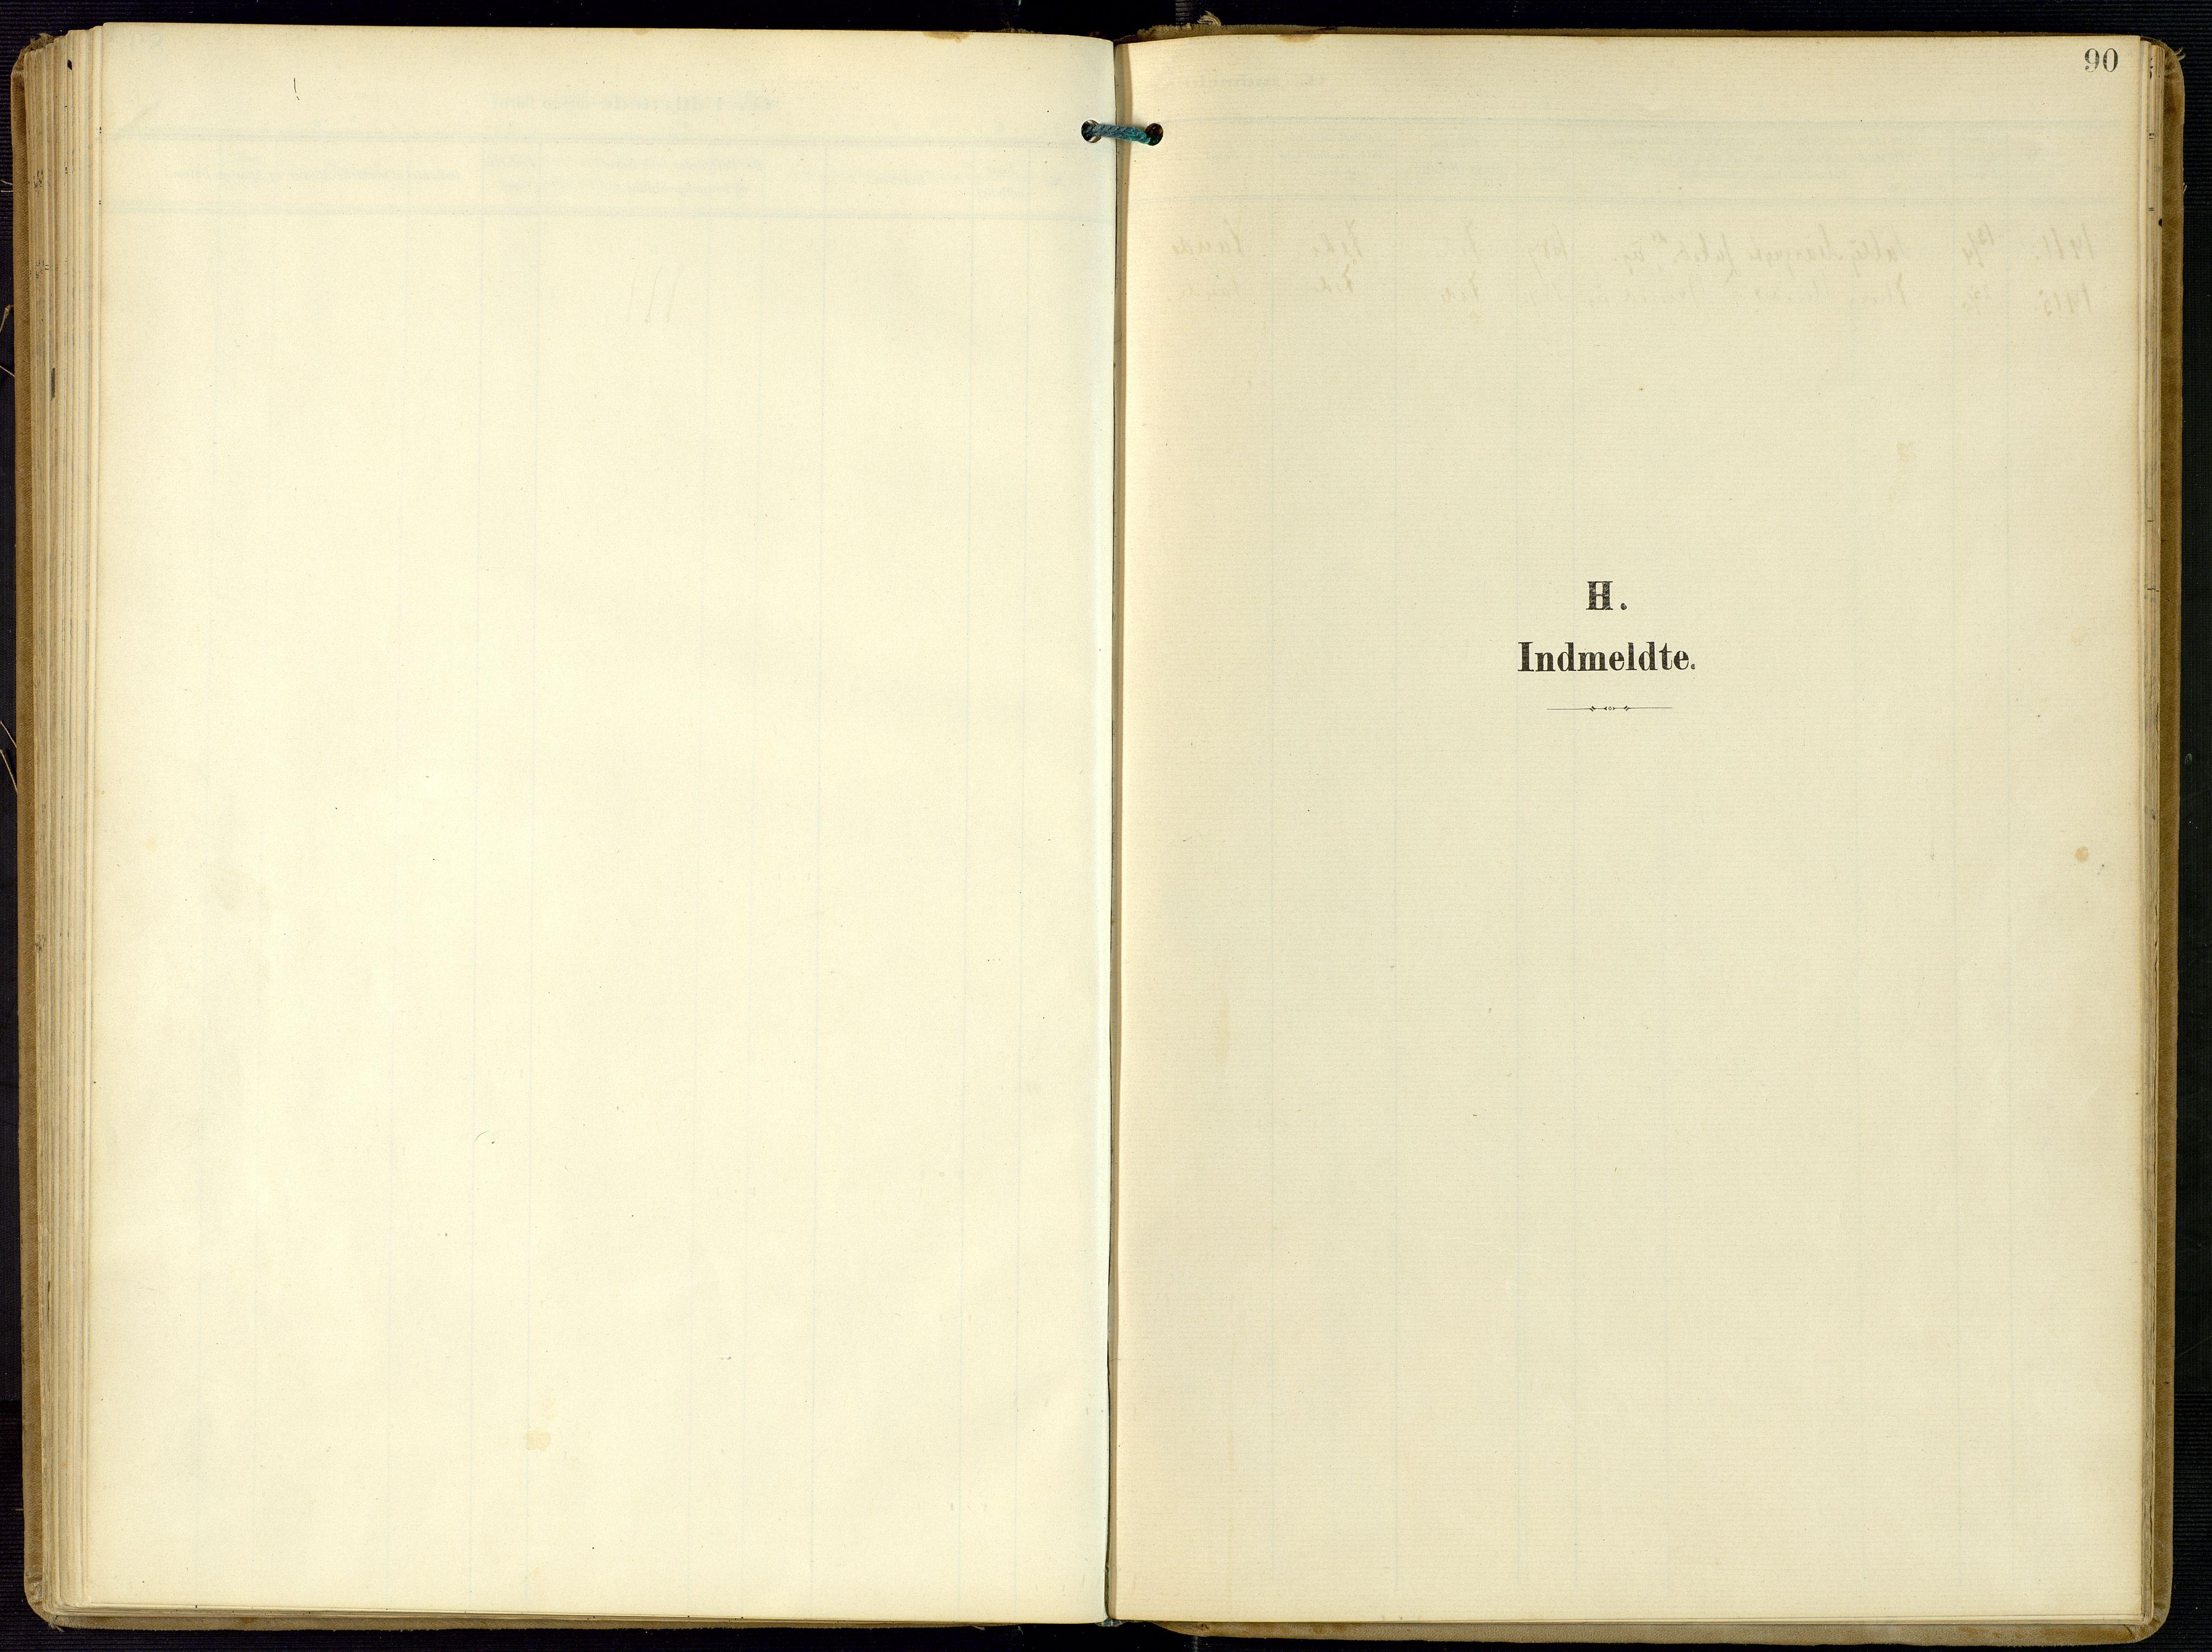 SAK, Kvinesdal sokneprestkontor, F/Fa/Faa/L0005: Ministerialbok nr. A 5, 1898-1915, s. 90